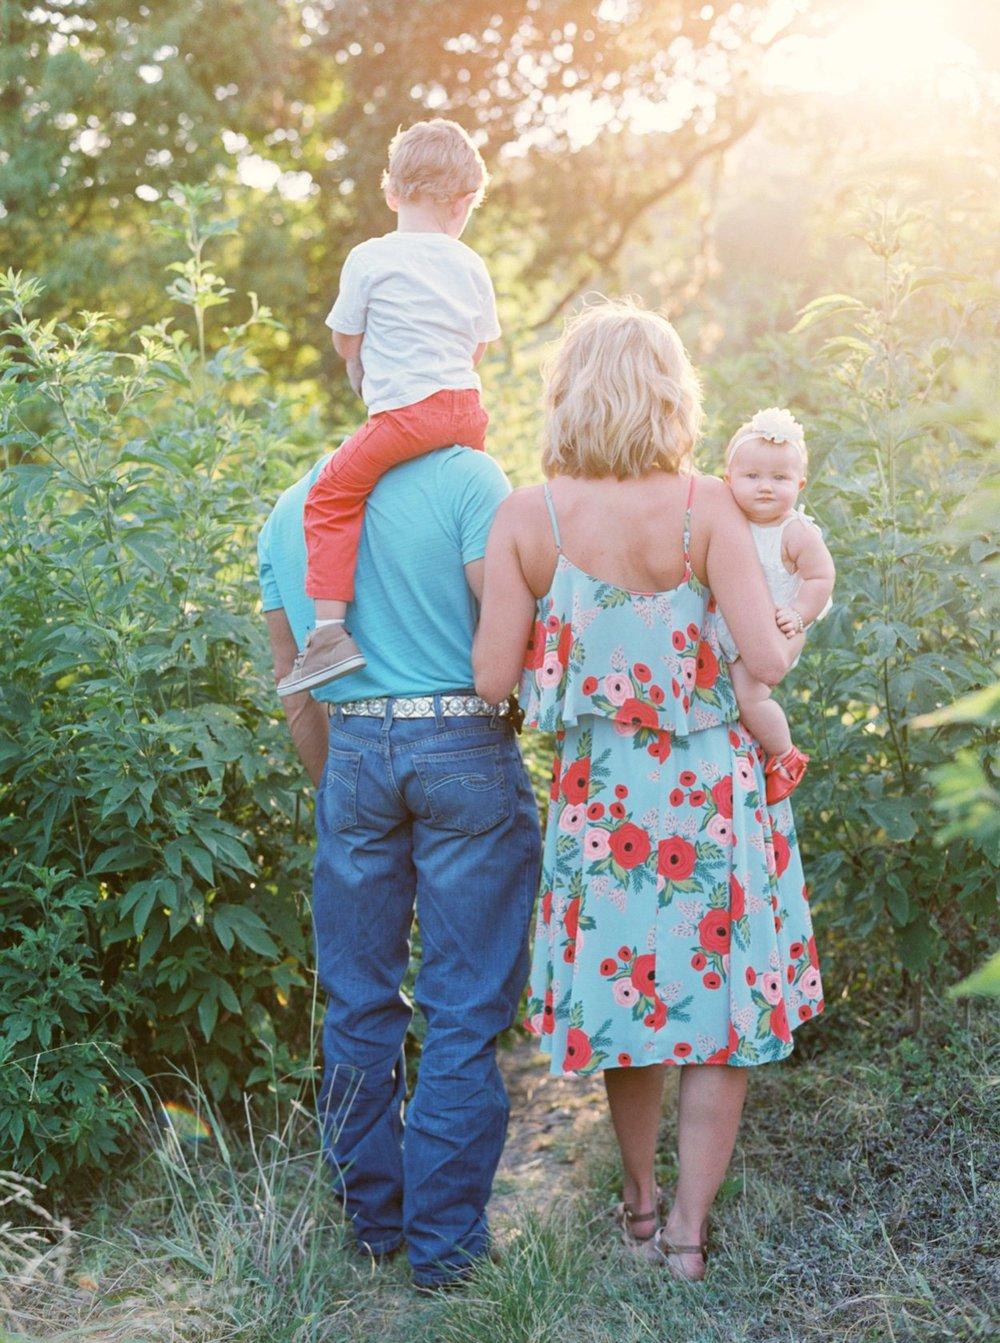 c47a1-austinfamilyphotographeraustinfamilyphotographer.jpg